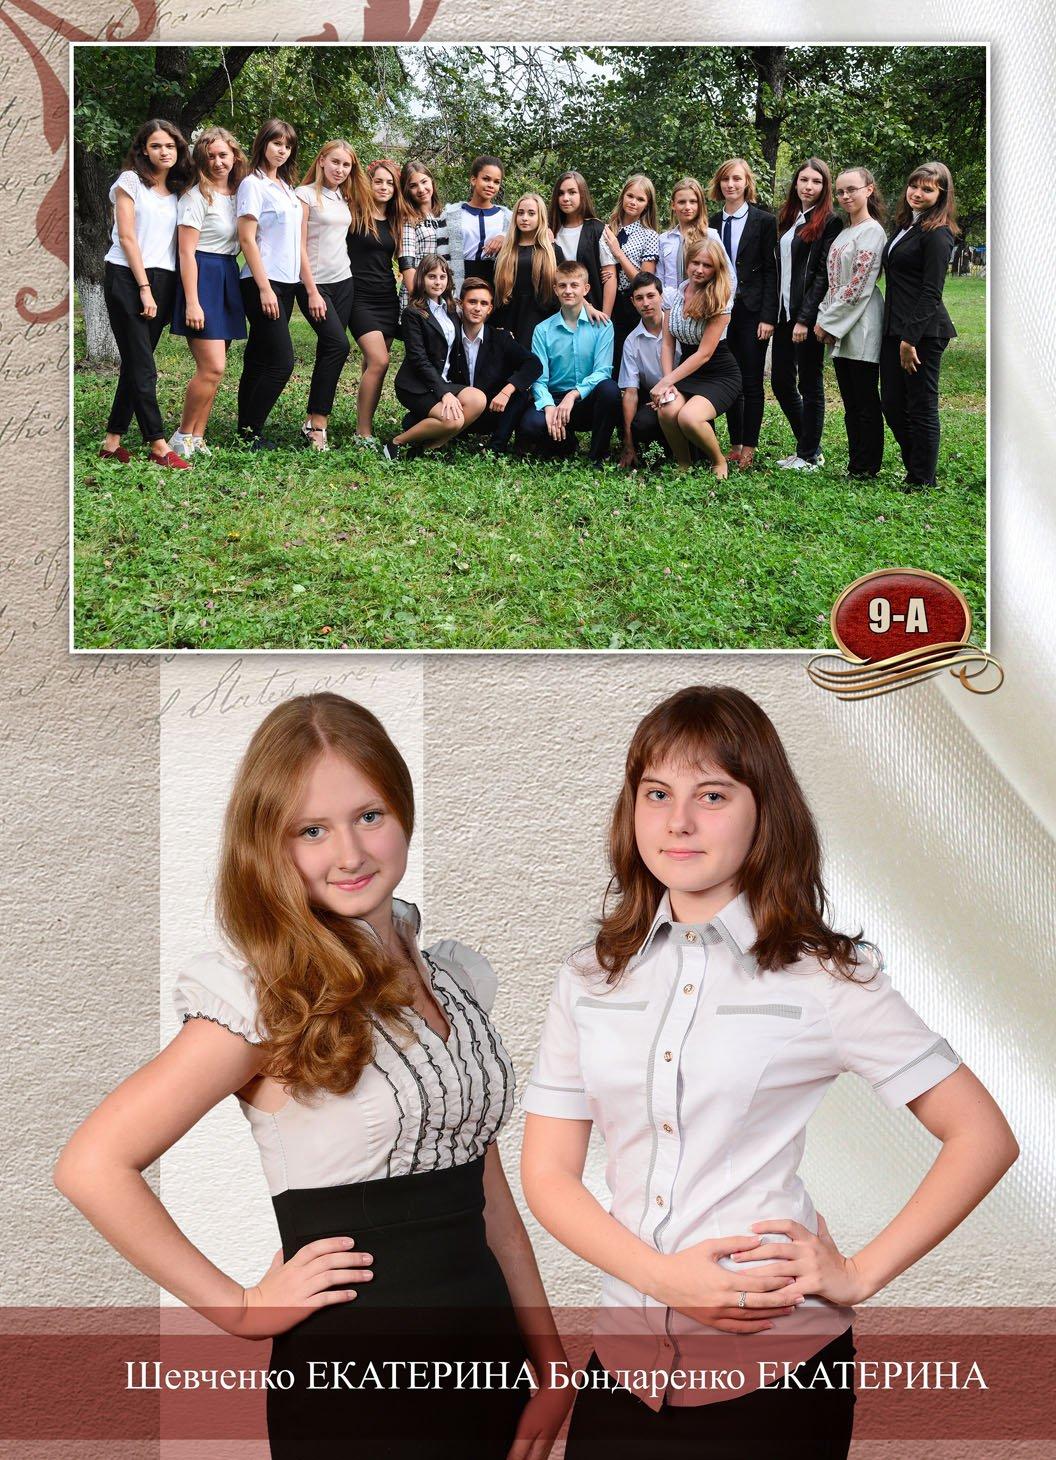 https://school-photo.com.ua/wp-content/uploads/2017/07/02-8.jpg